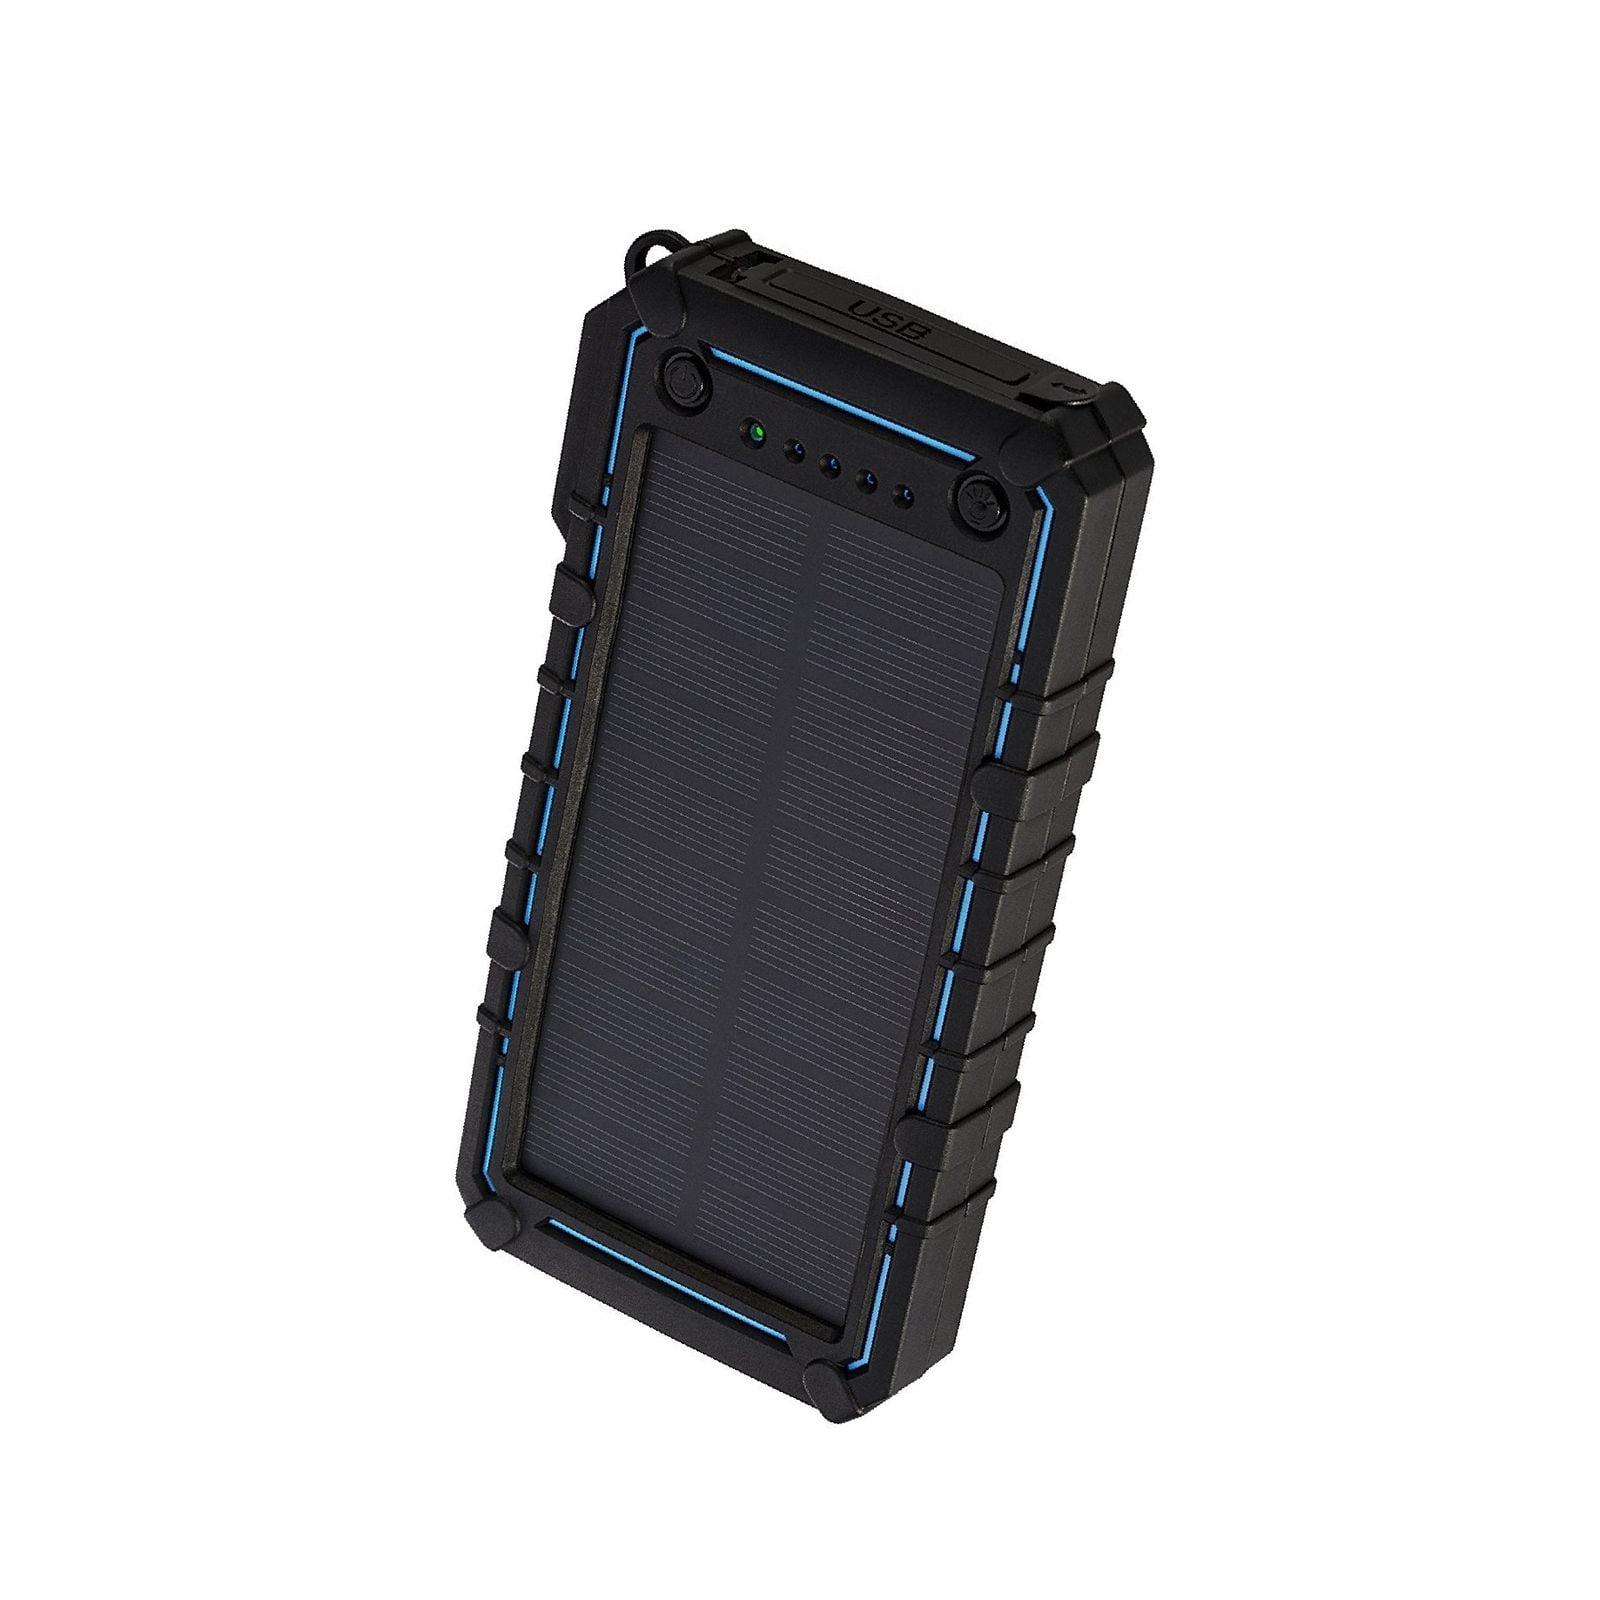 JETSUN Solar Charger 16750mAh Portable Solar Power Bank with Waterproof  Solar